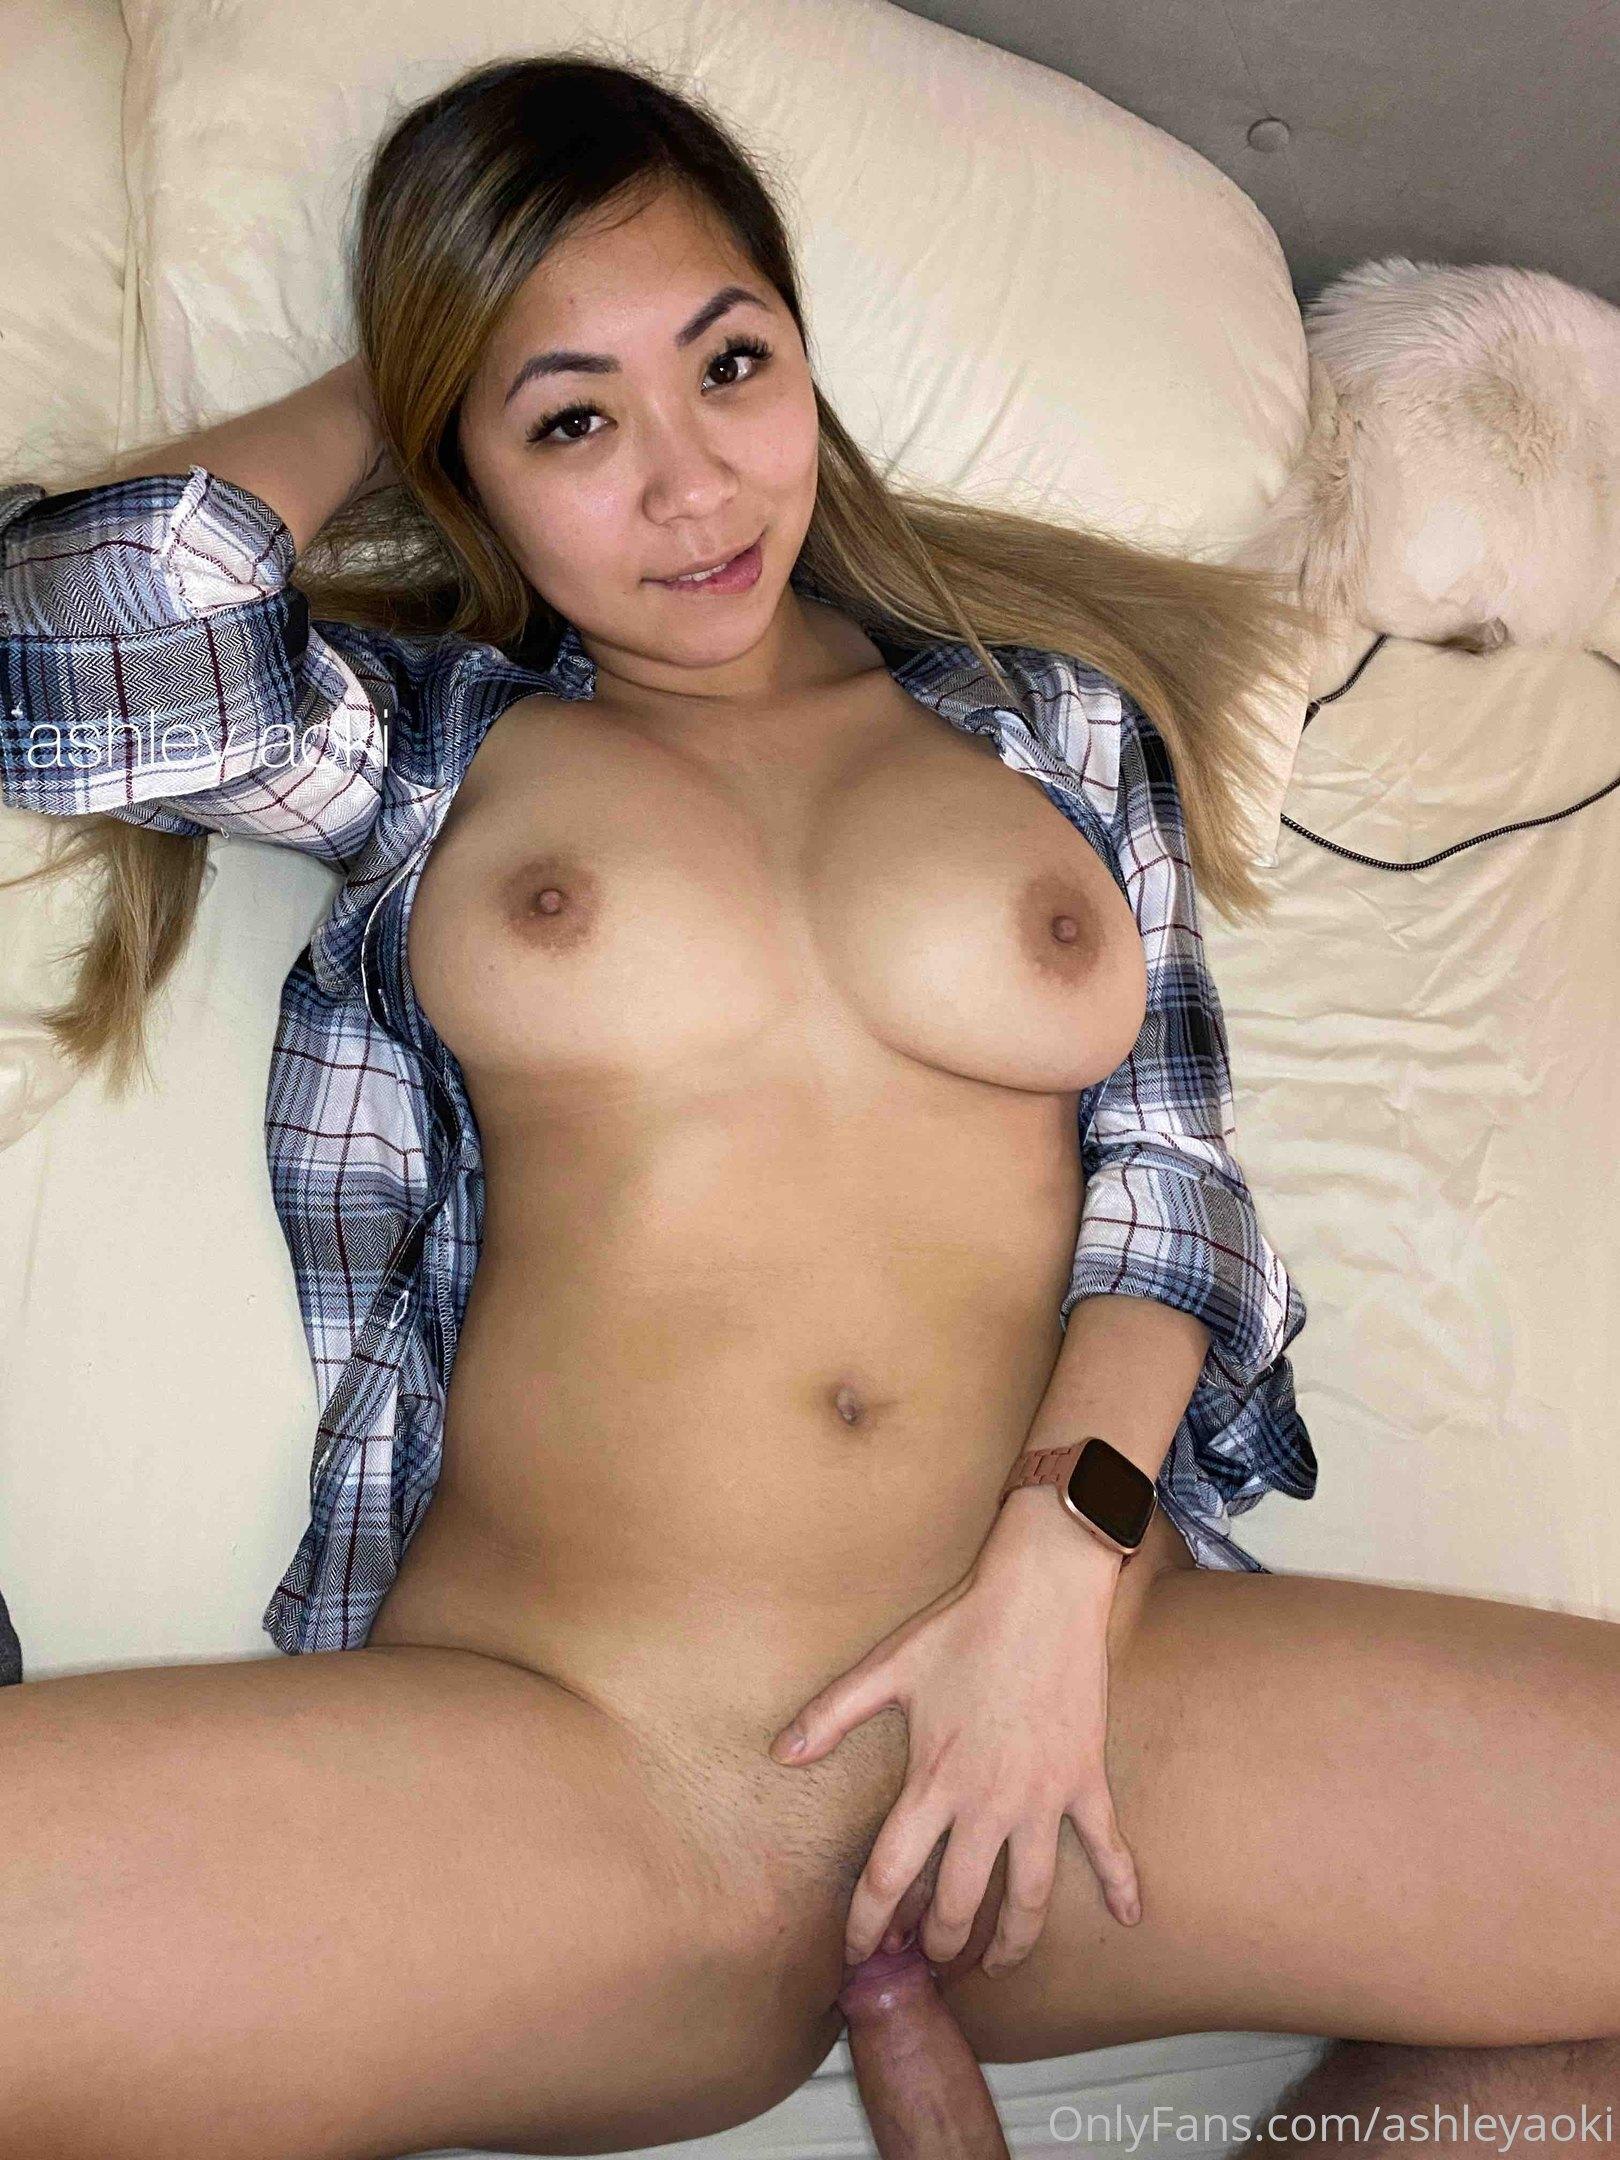 Ashley Aoki, Ashleyaoki, Onlyfans Leaks 0132